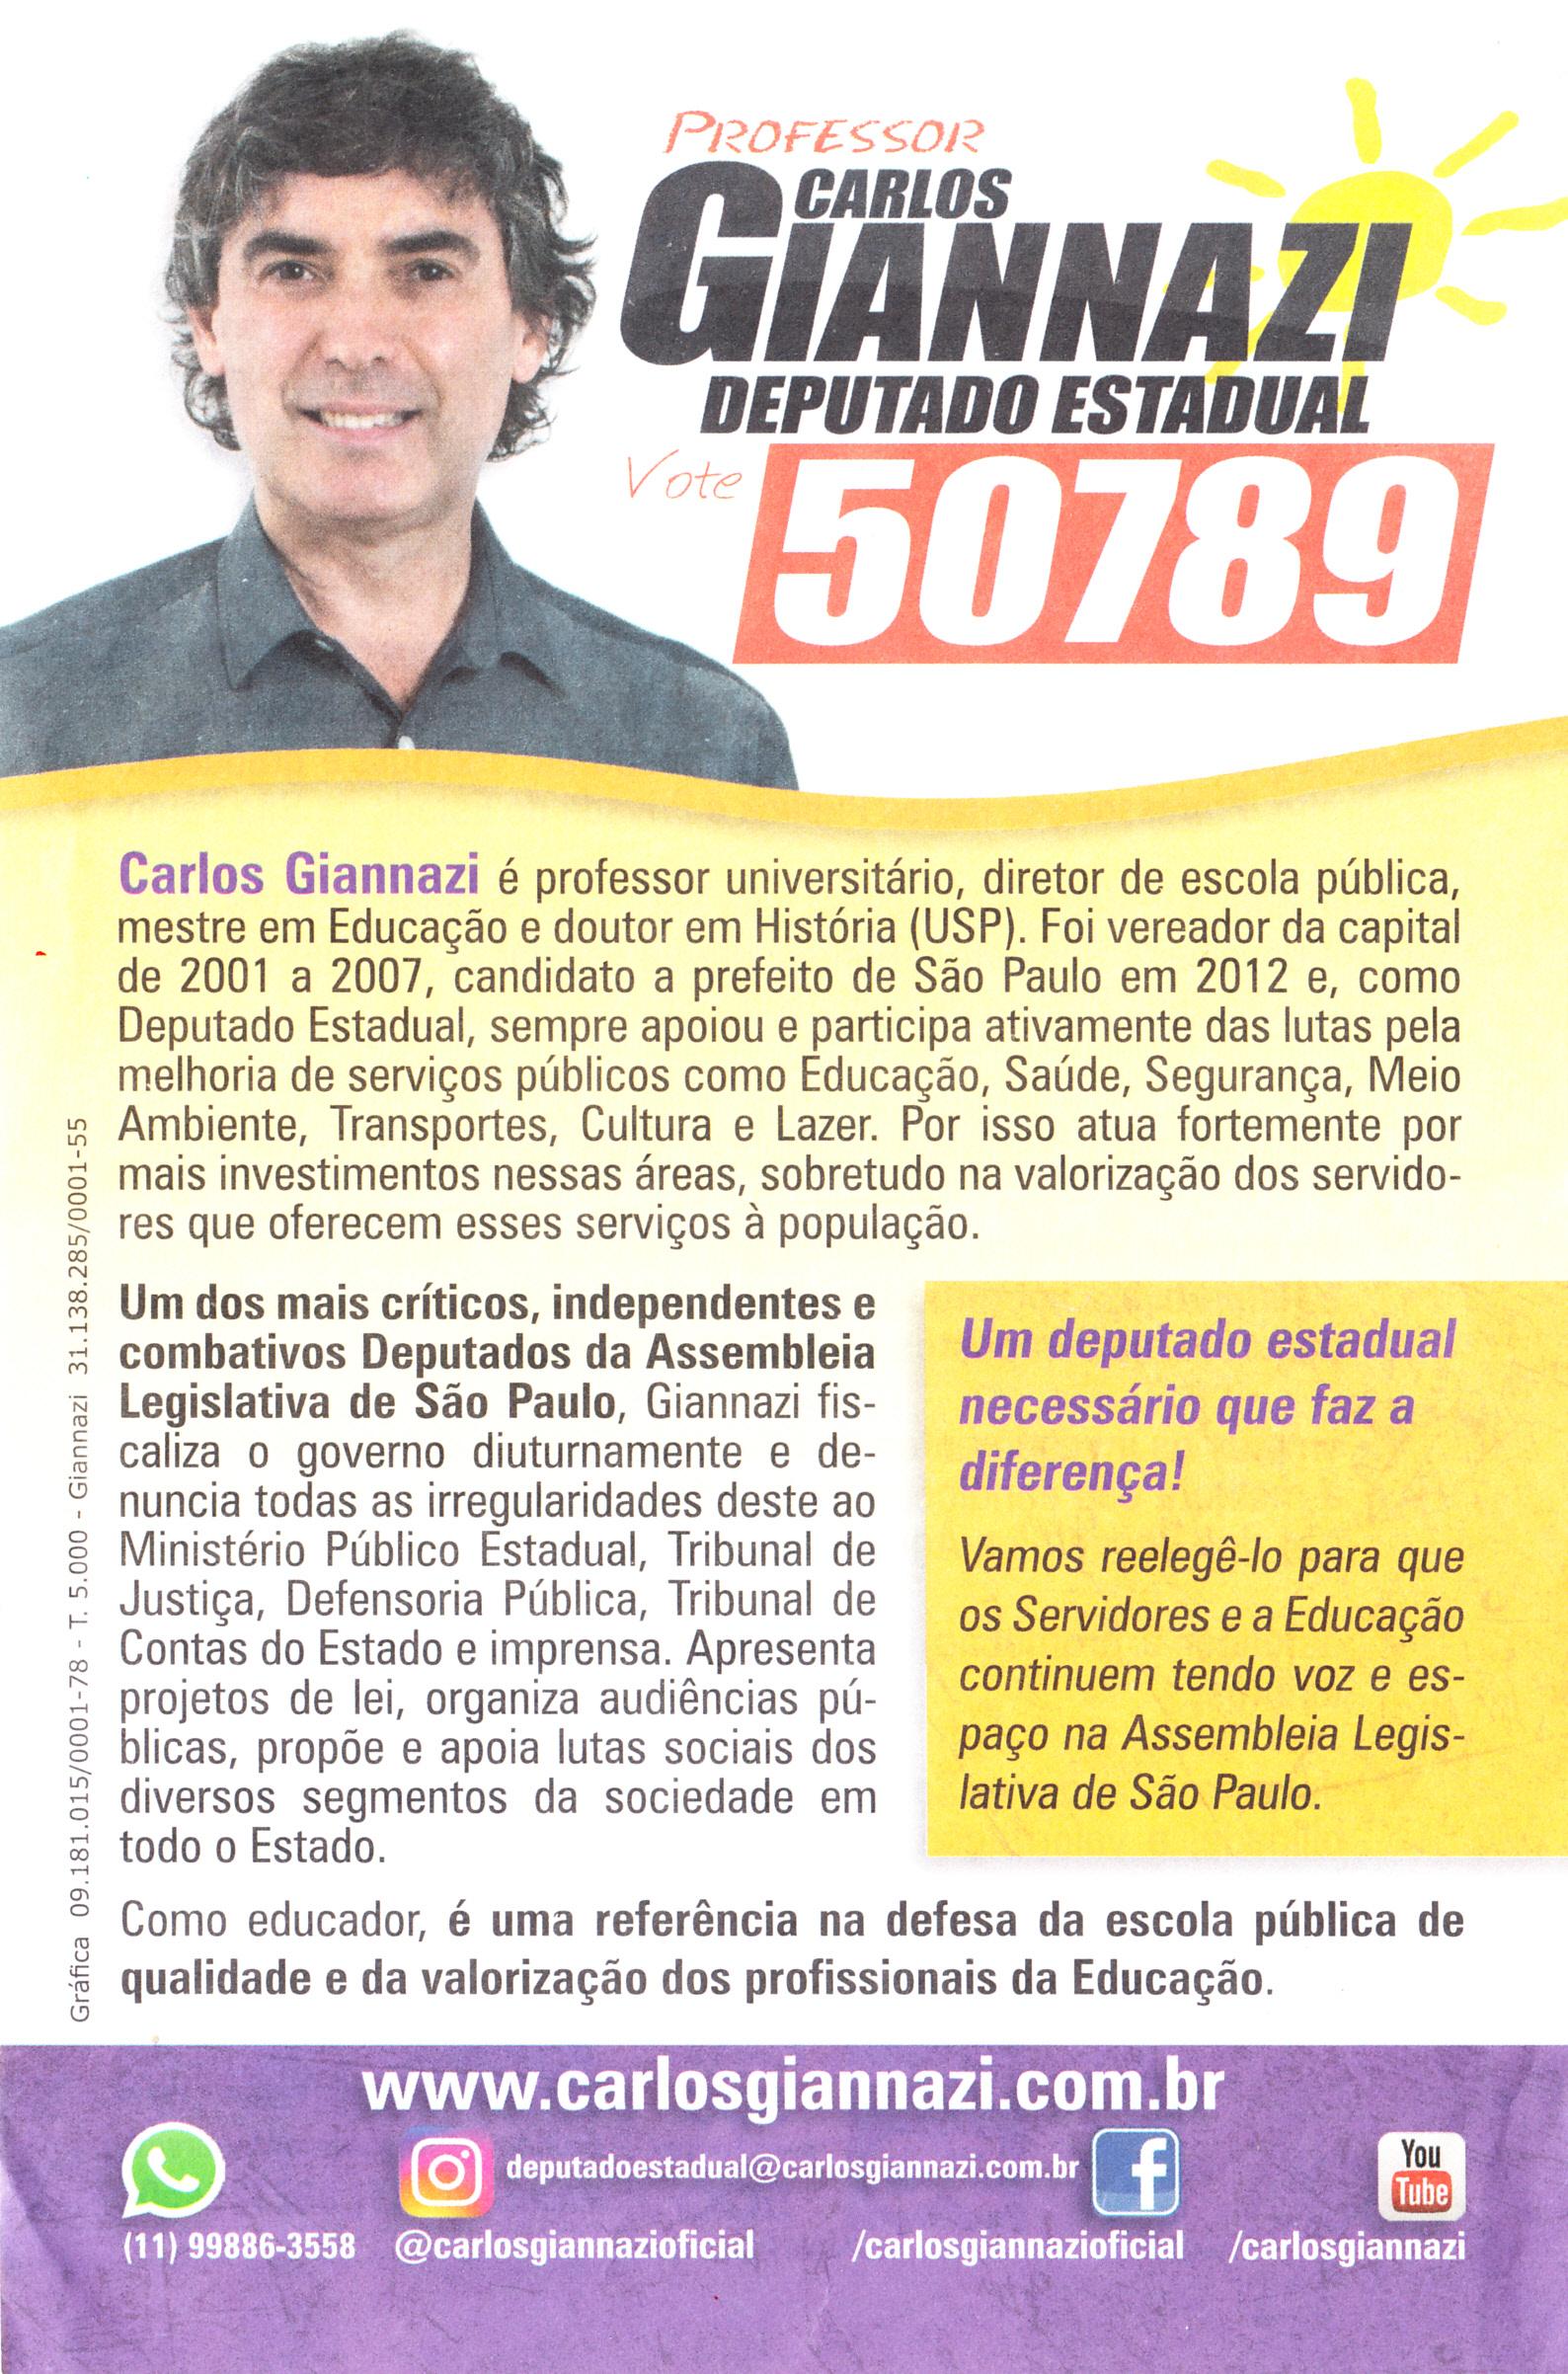 PSOL_2018_0007